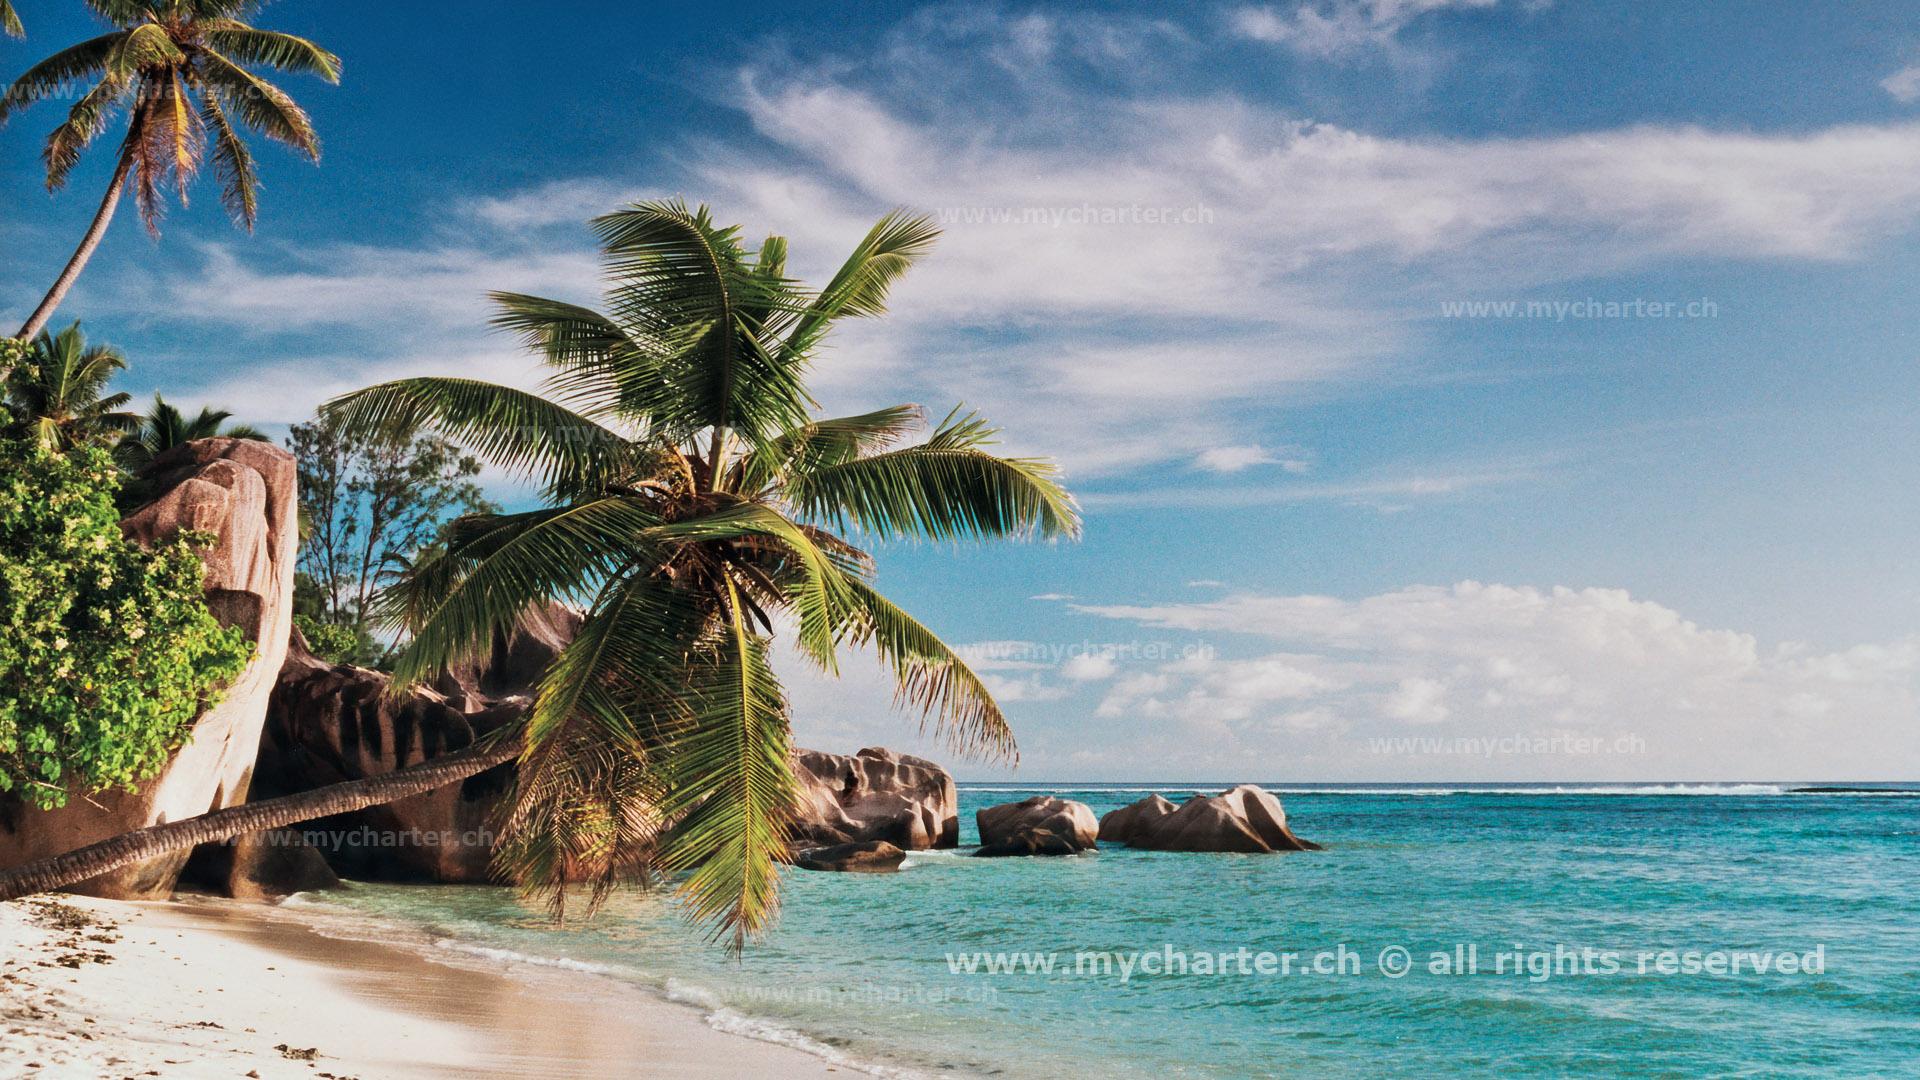 Seychellen - Anse Source d Argent